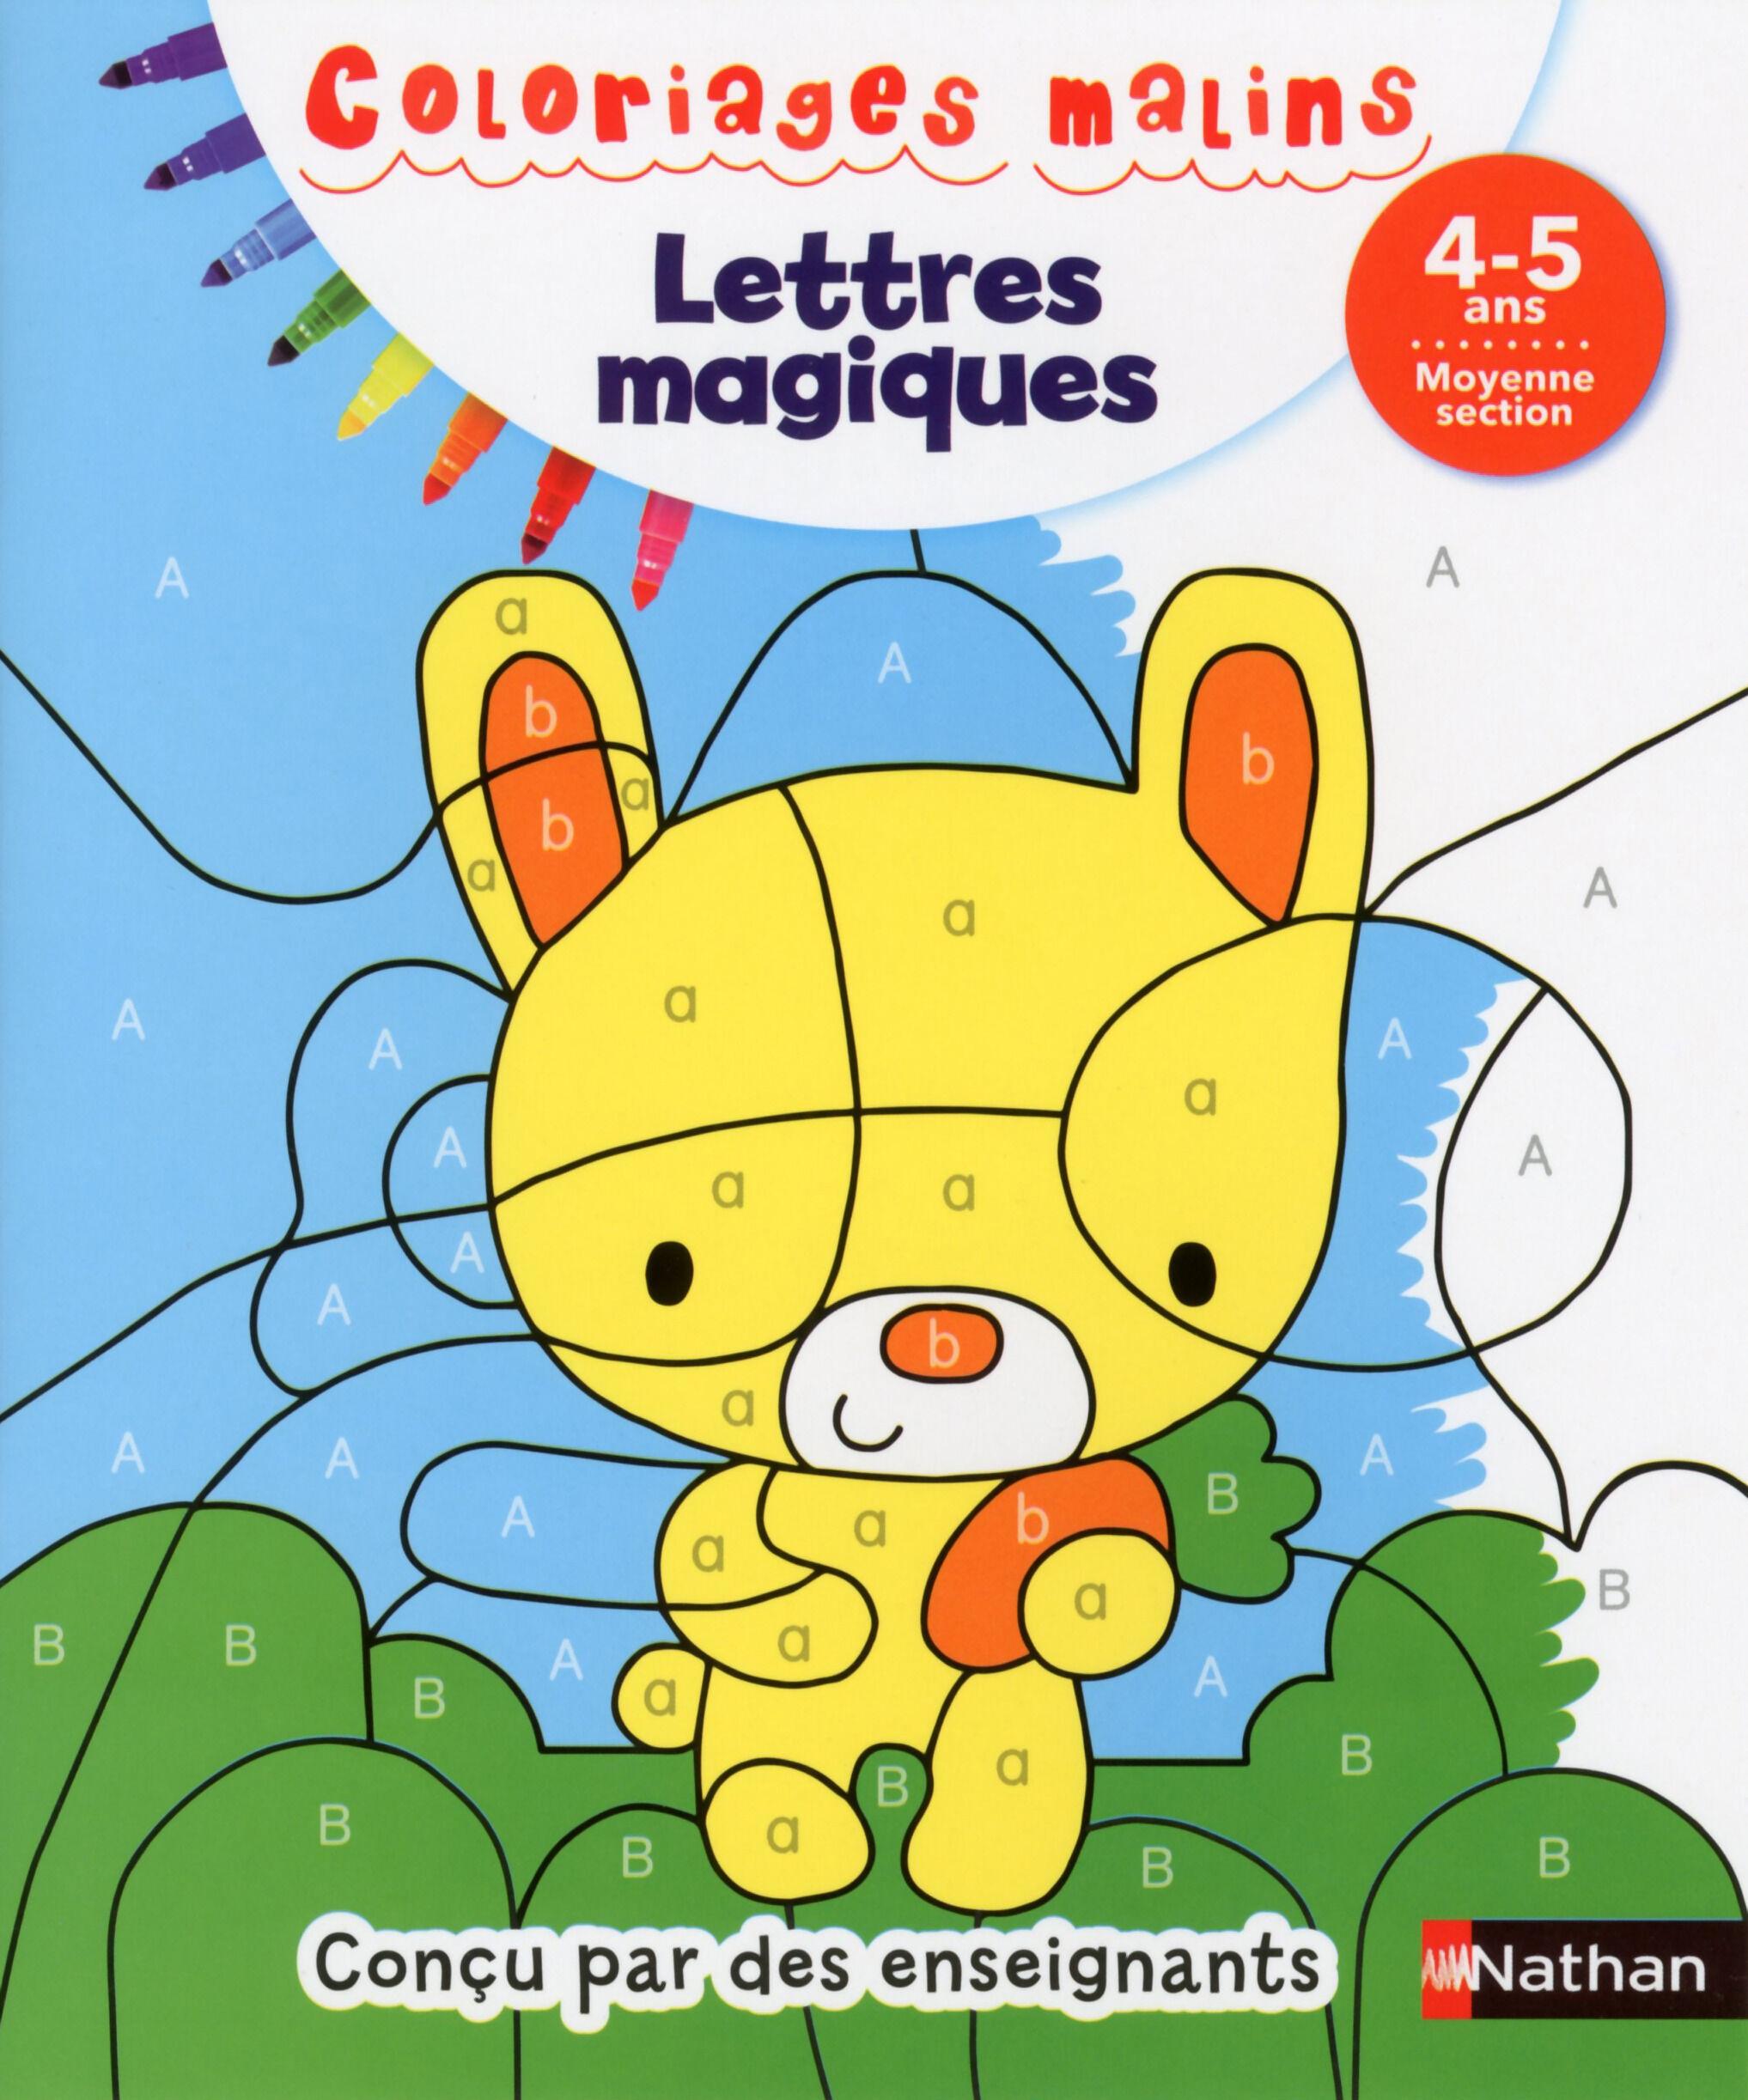 Coloriages malins - Lettres magiques moyenne section 4/5 ans